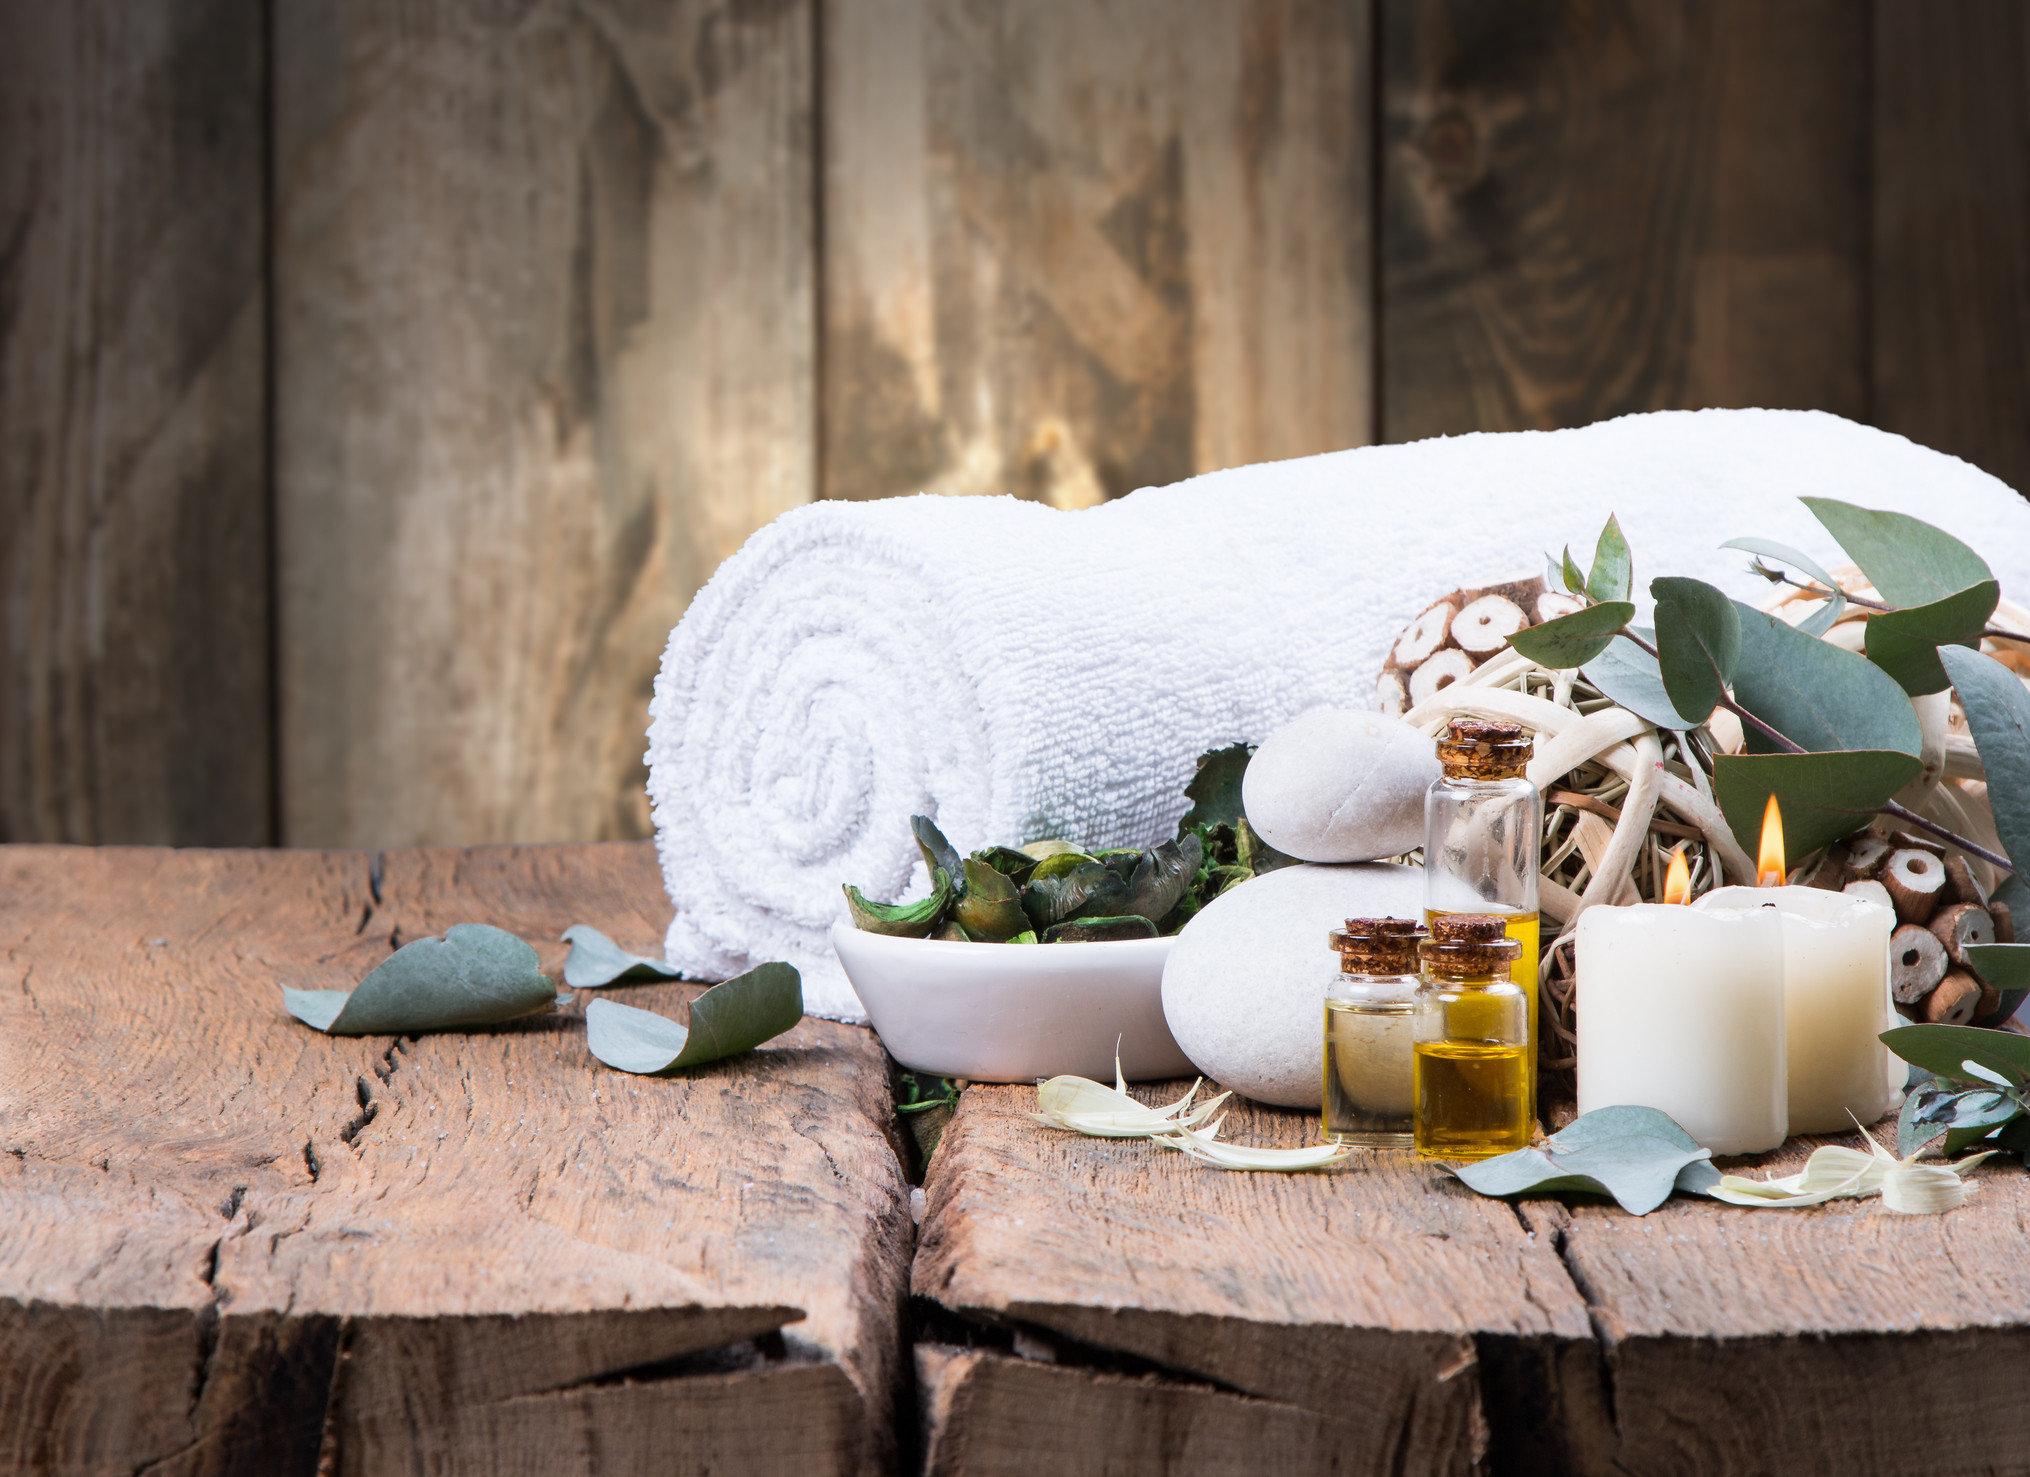 Health + Wellness Spa Retreats Travel Tips green flower spring ceremony sofa stone